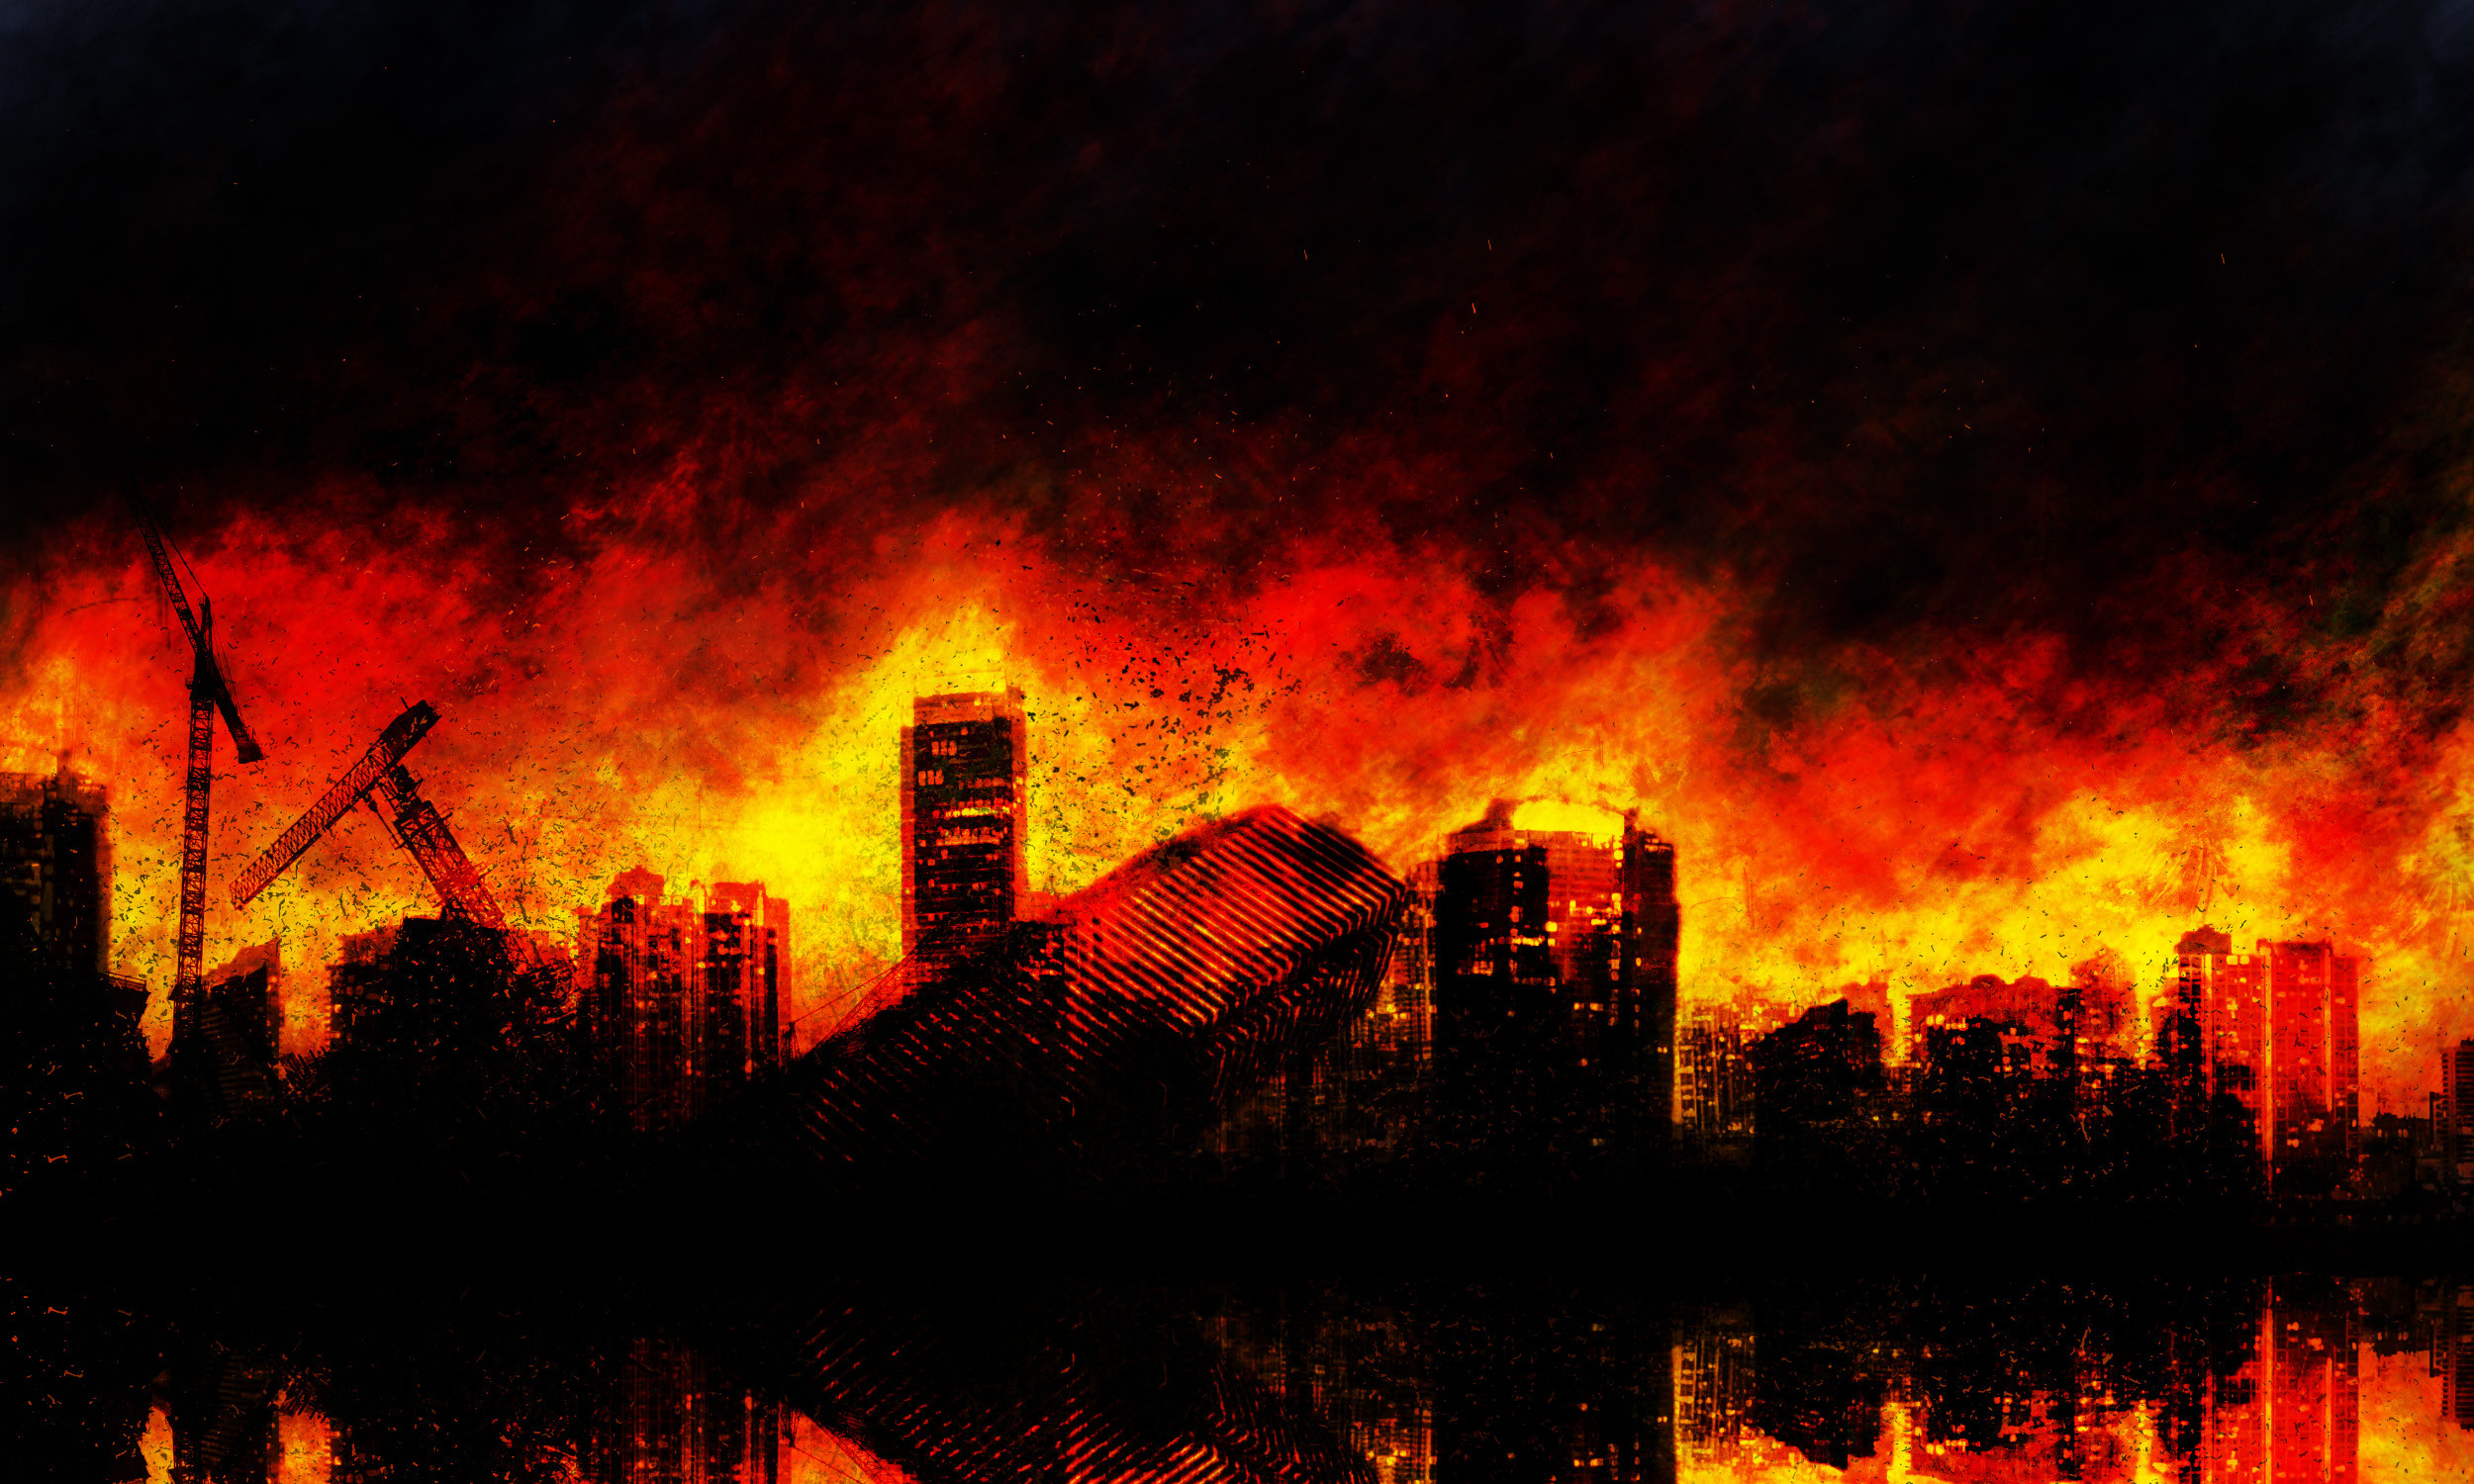 Burning City Background 183 ① Wallpapertag